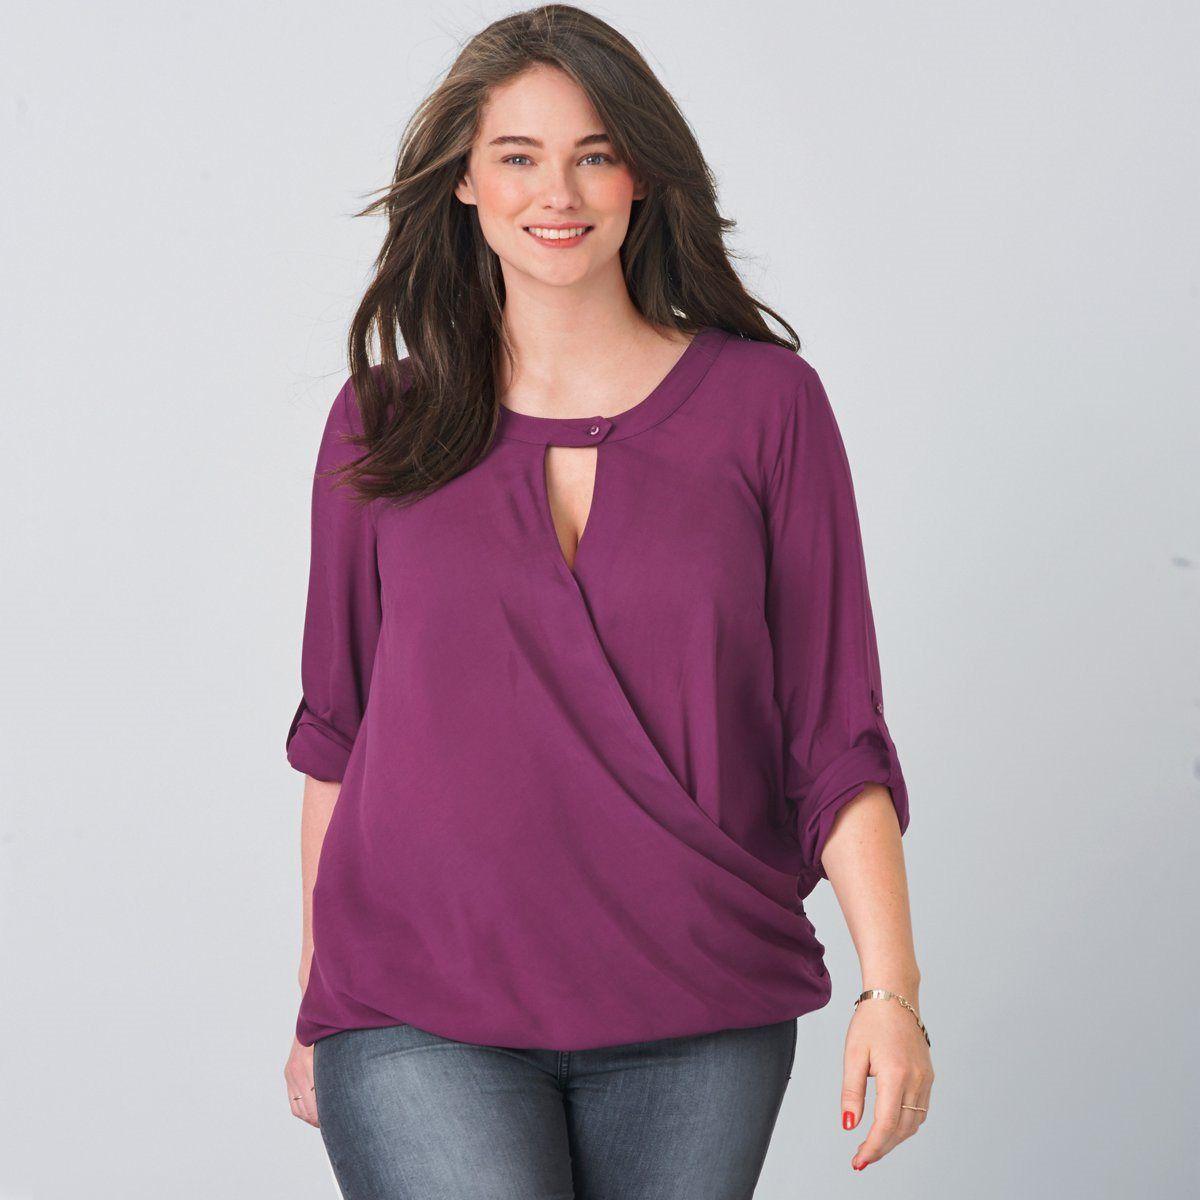 Blusa traçada, plus size, Taillissime | La Redoute